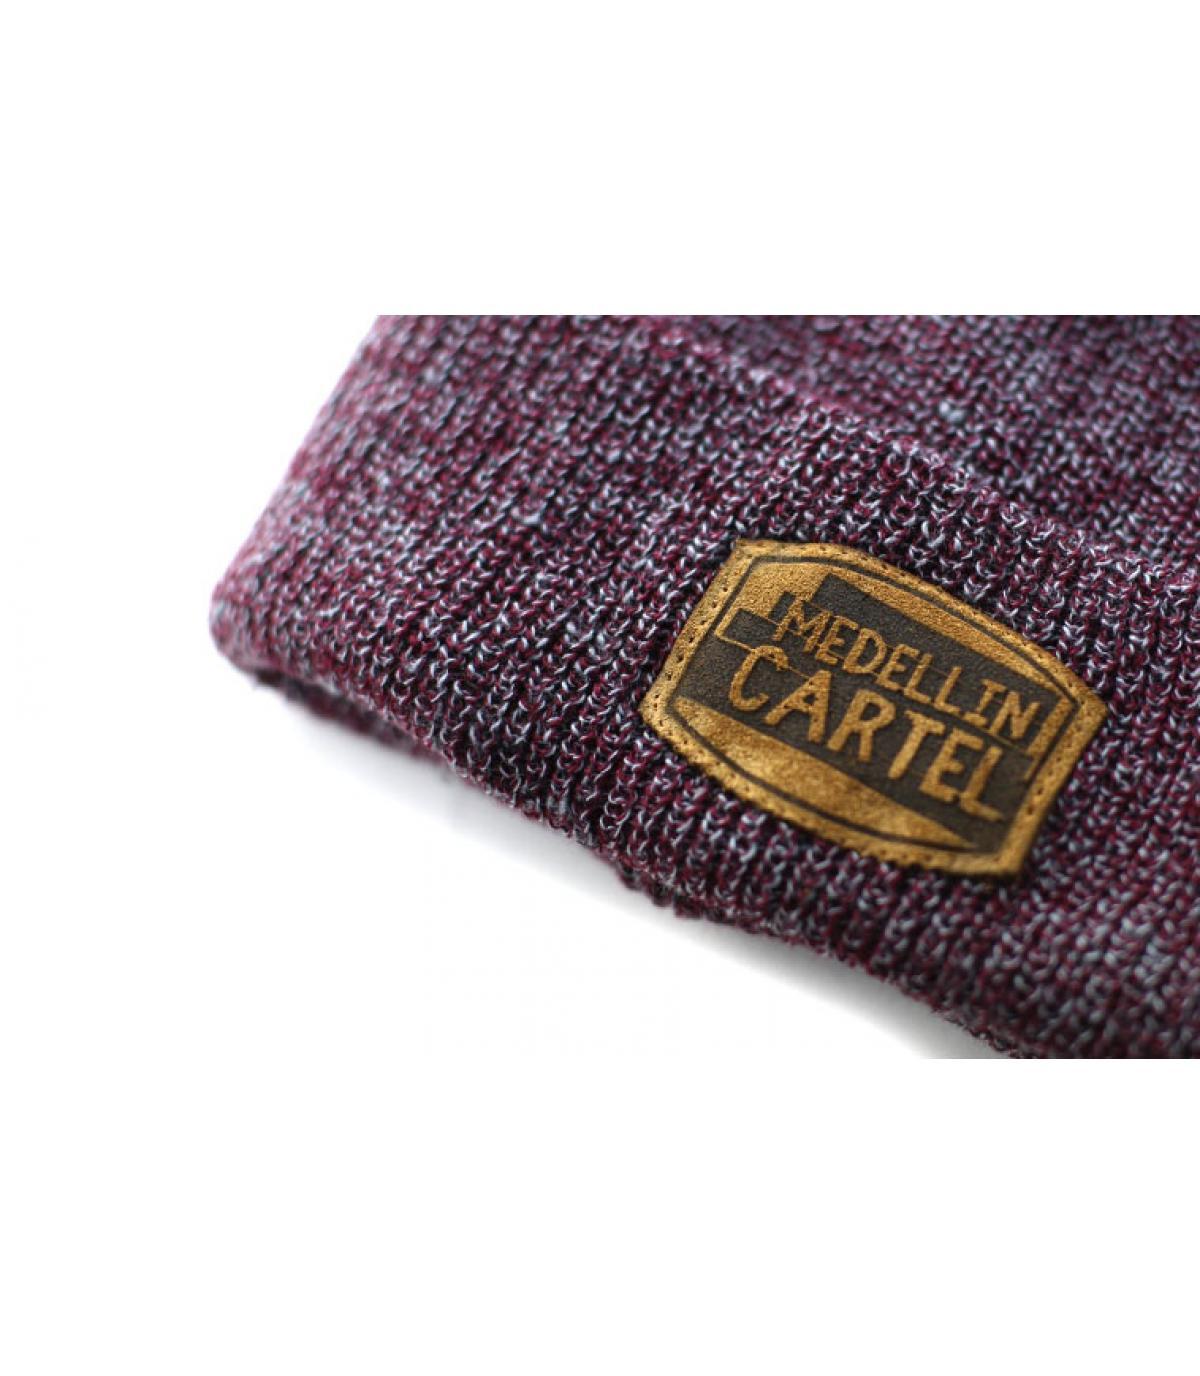 Détails Bonnet Medellin Cartel burgundy heather - image 3